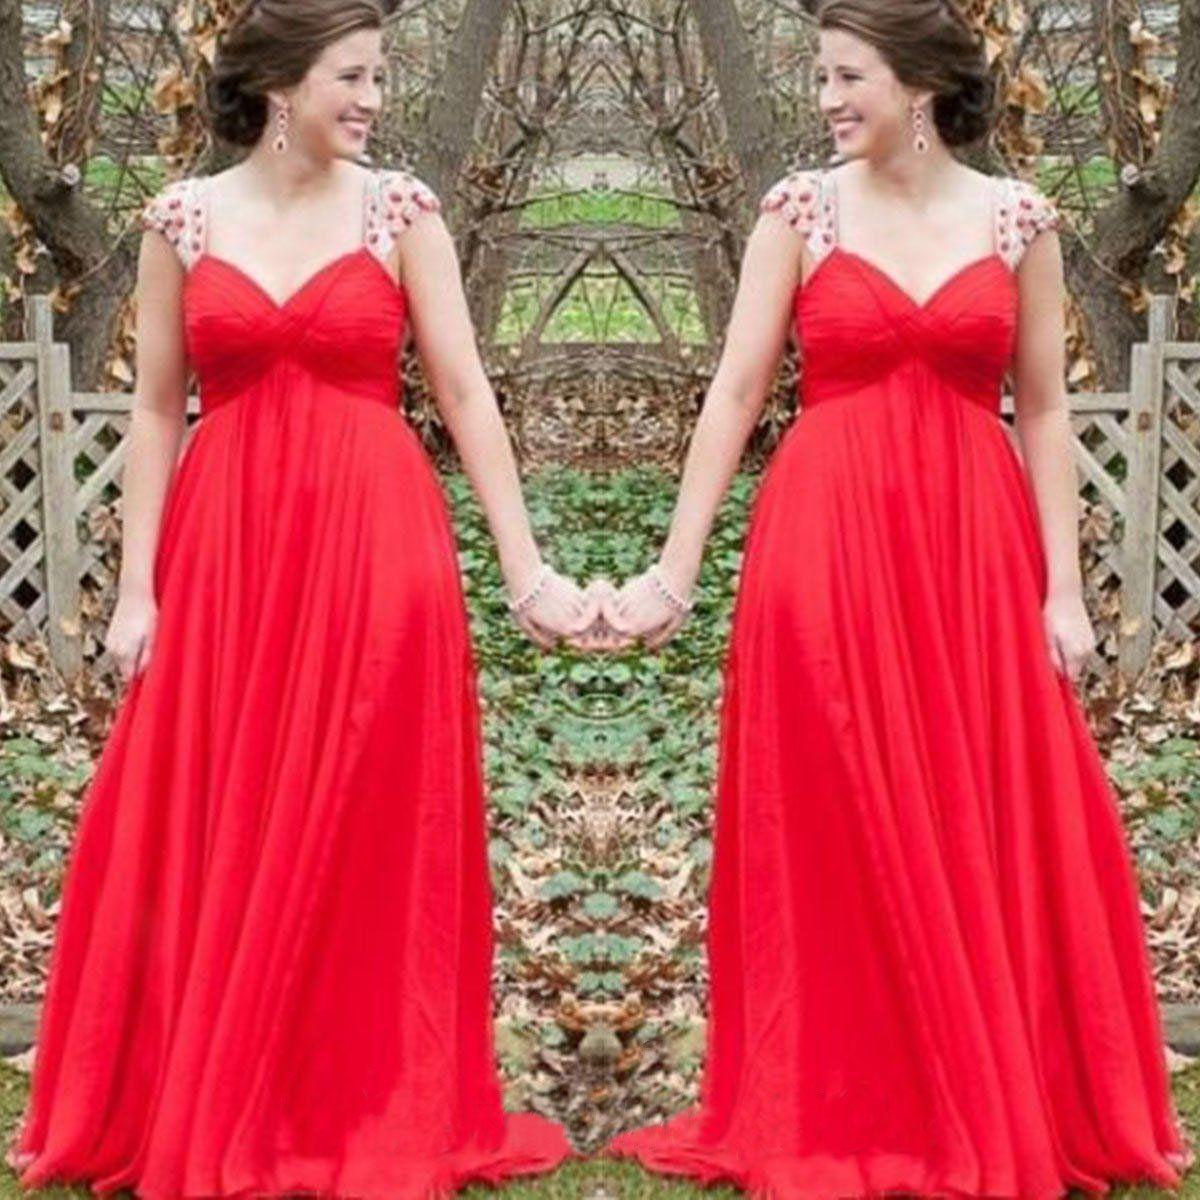 Chiffon prom dressesstraps prom dressmodest evening gownsparkly